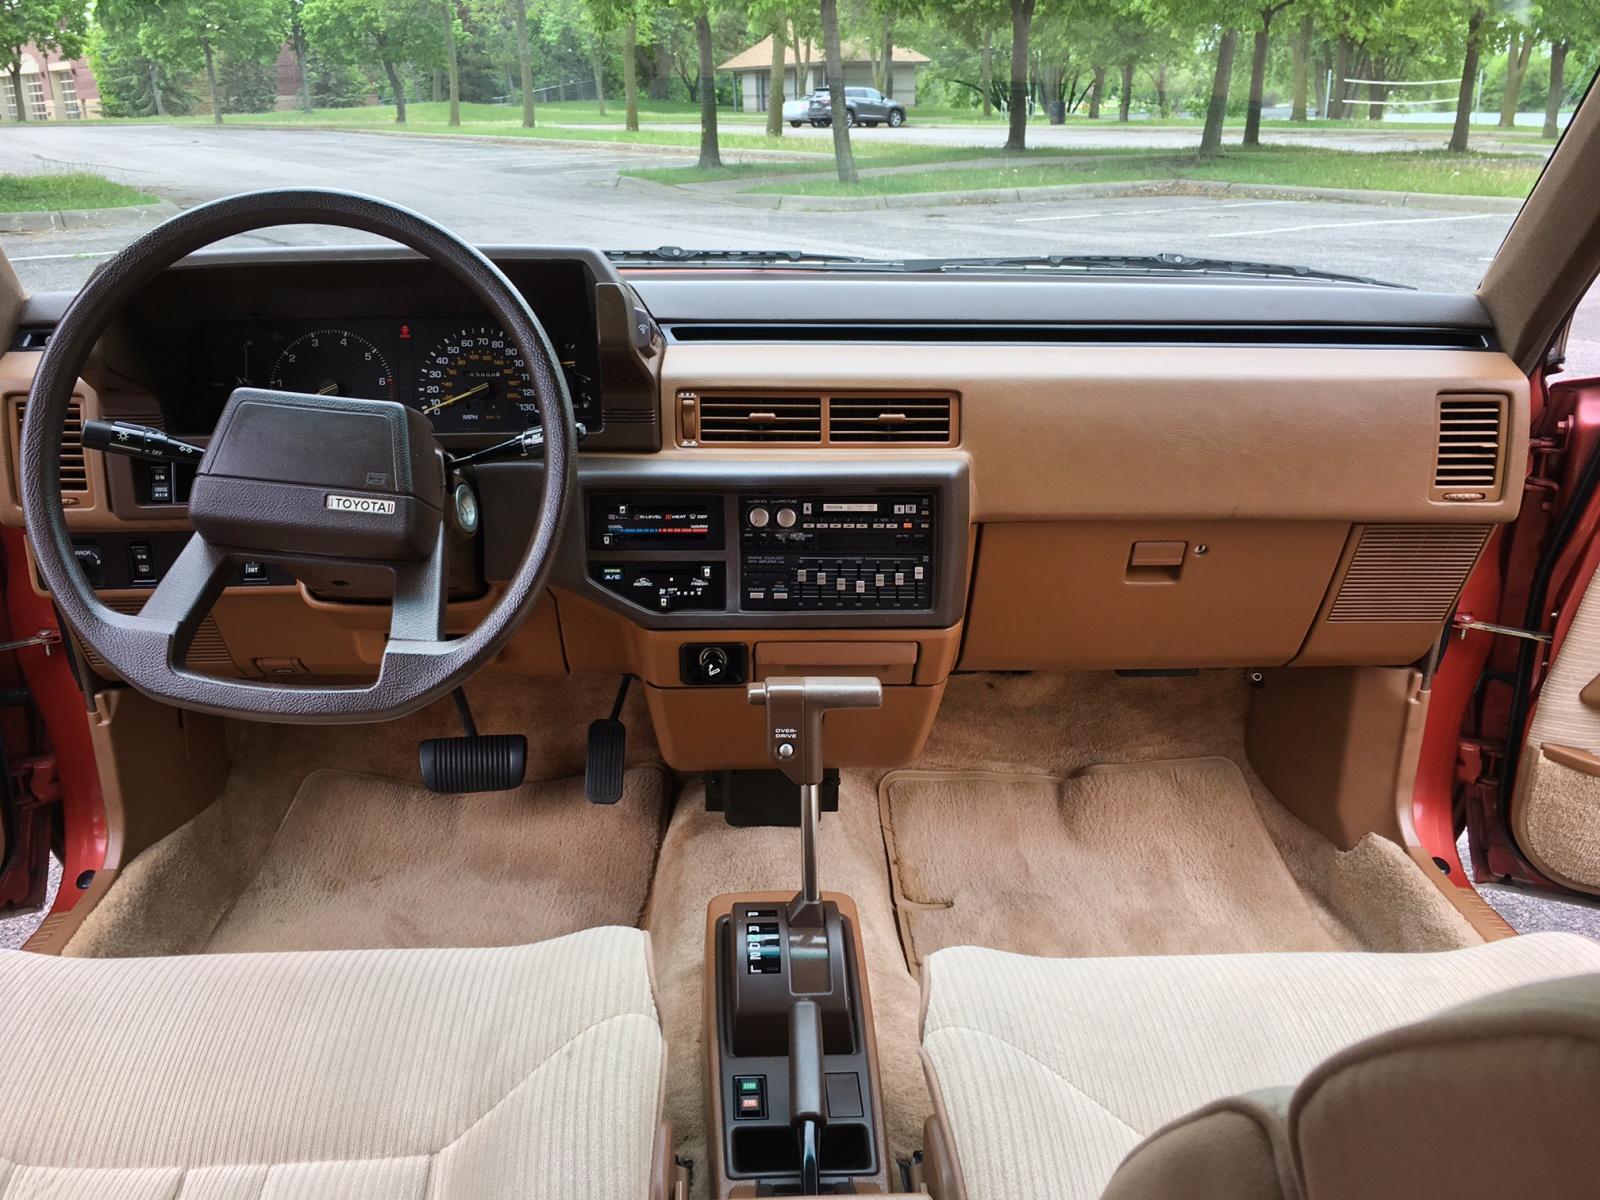 Scotty G S Garage 1984 Toyota Camry Liftback